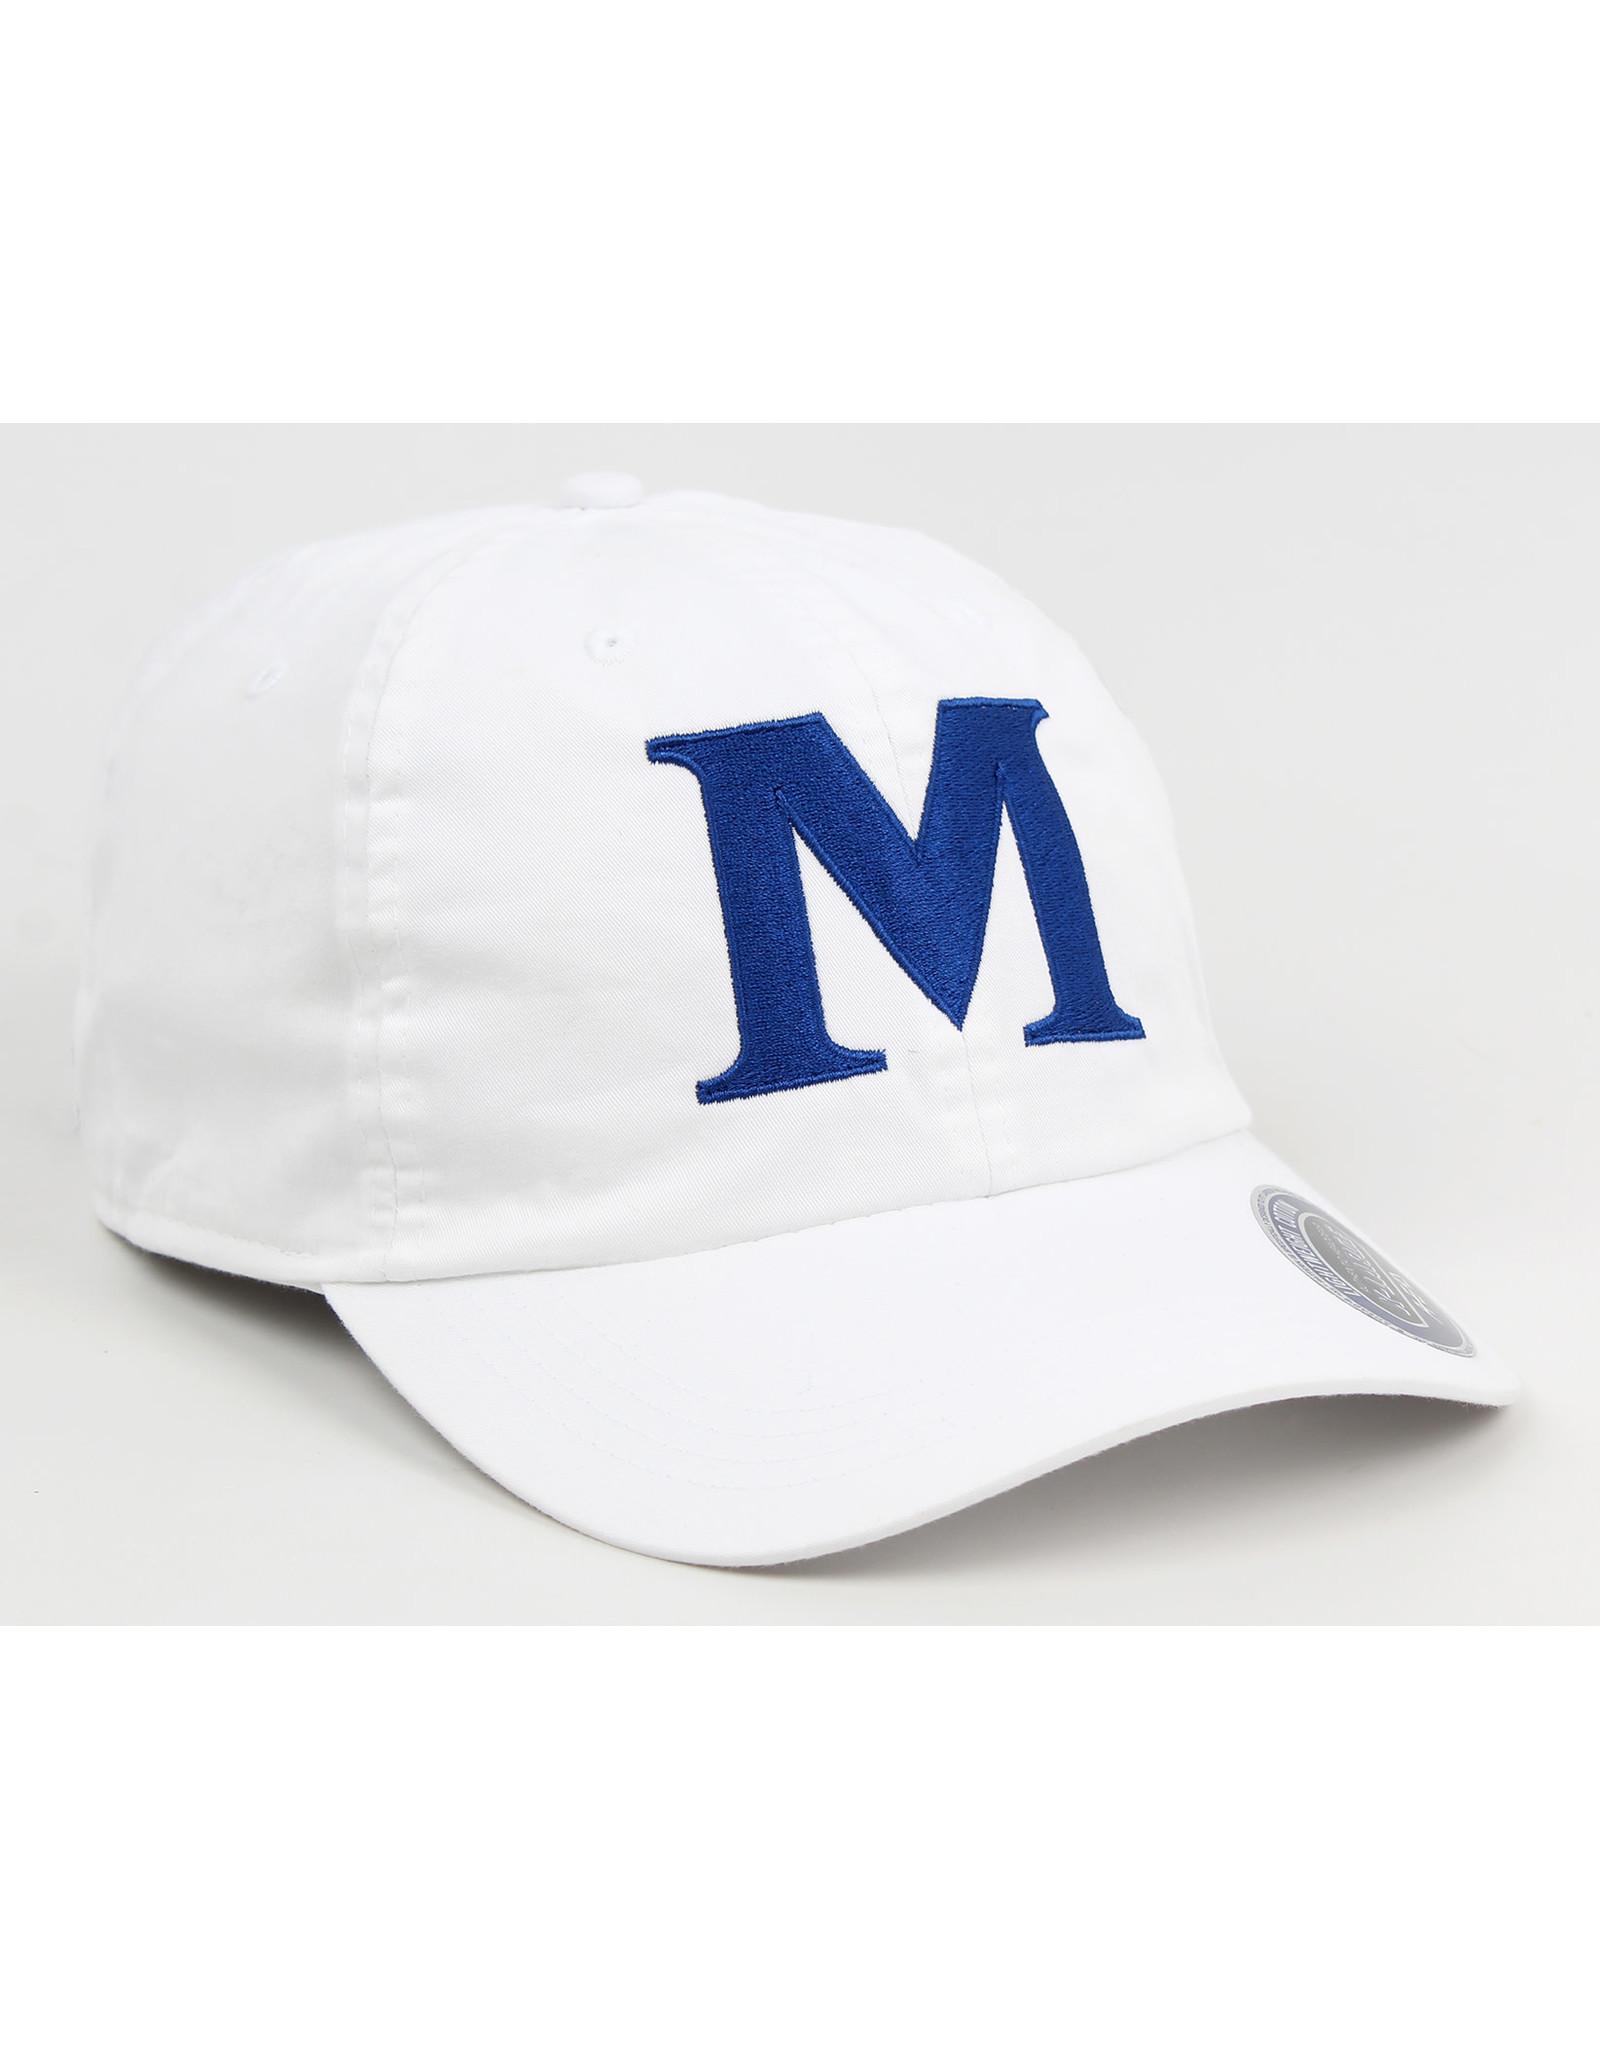 LIGHTWEIGHT WHITE CAP- XL